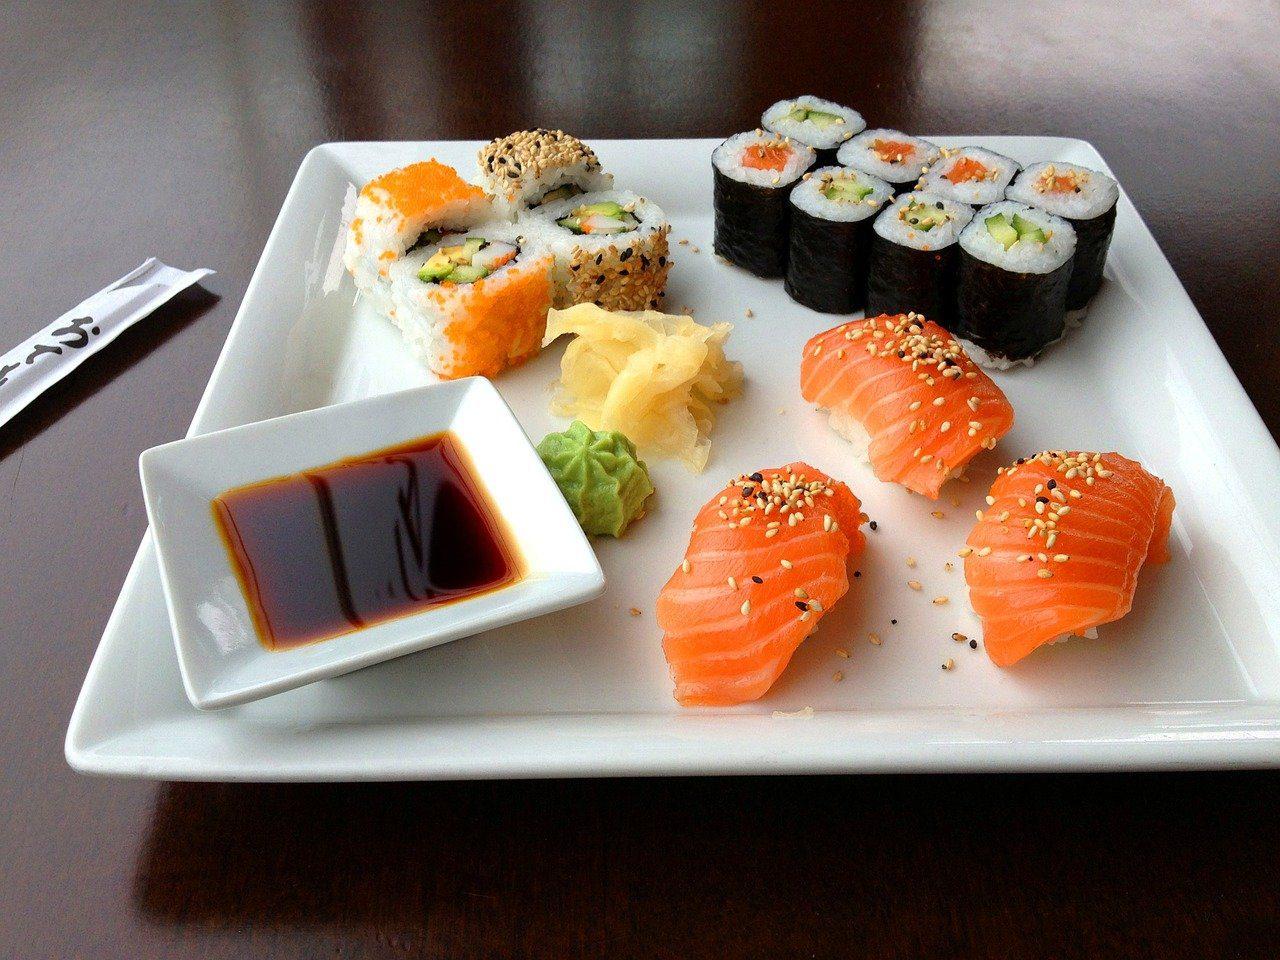 verschiedene Sushi-Arten